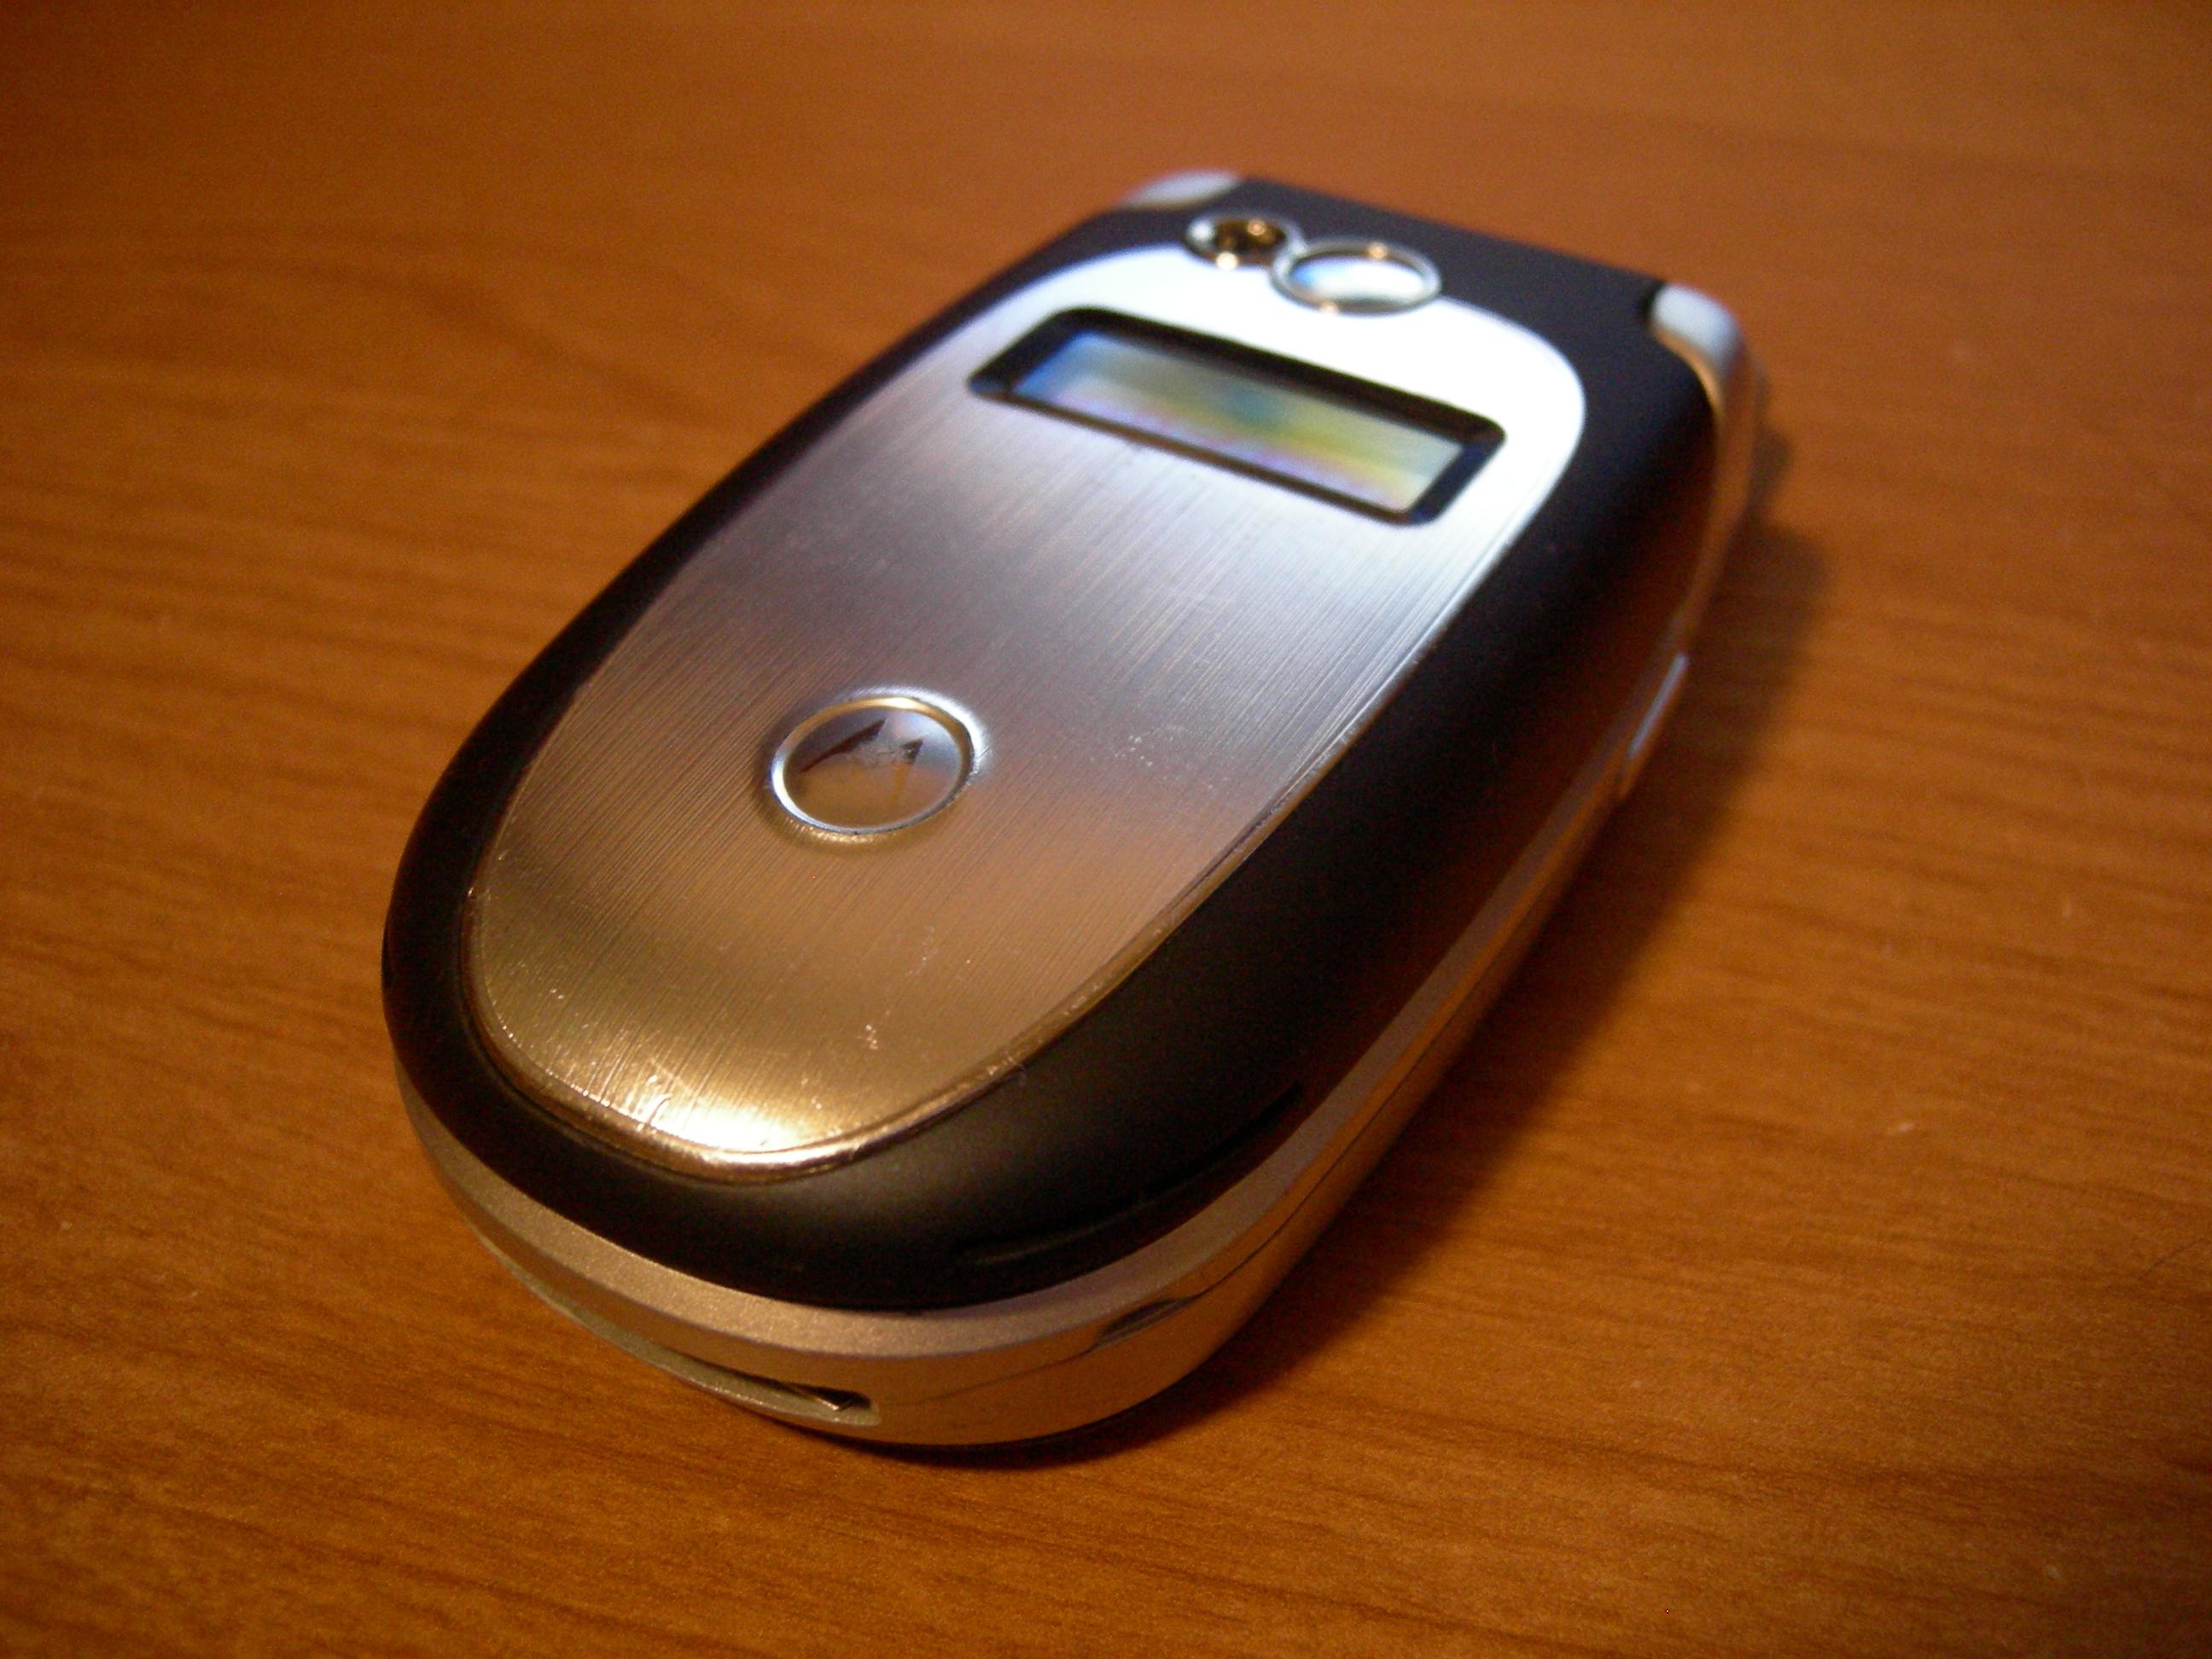 Fix the earpiece of your Motorola V551 phone.